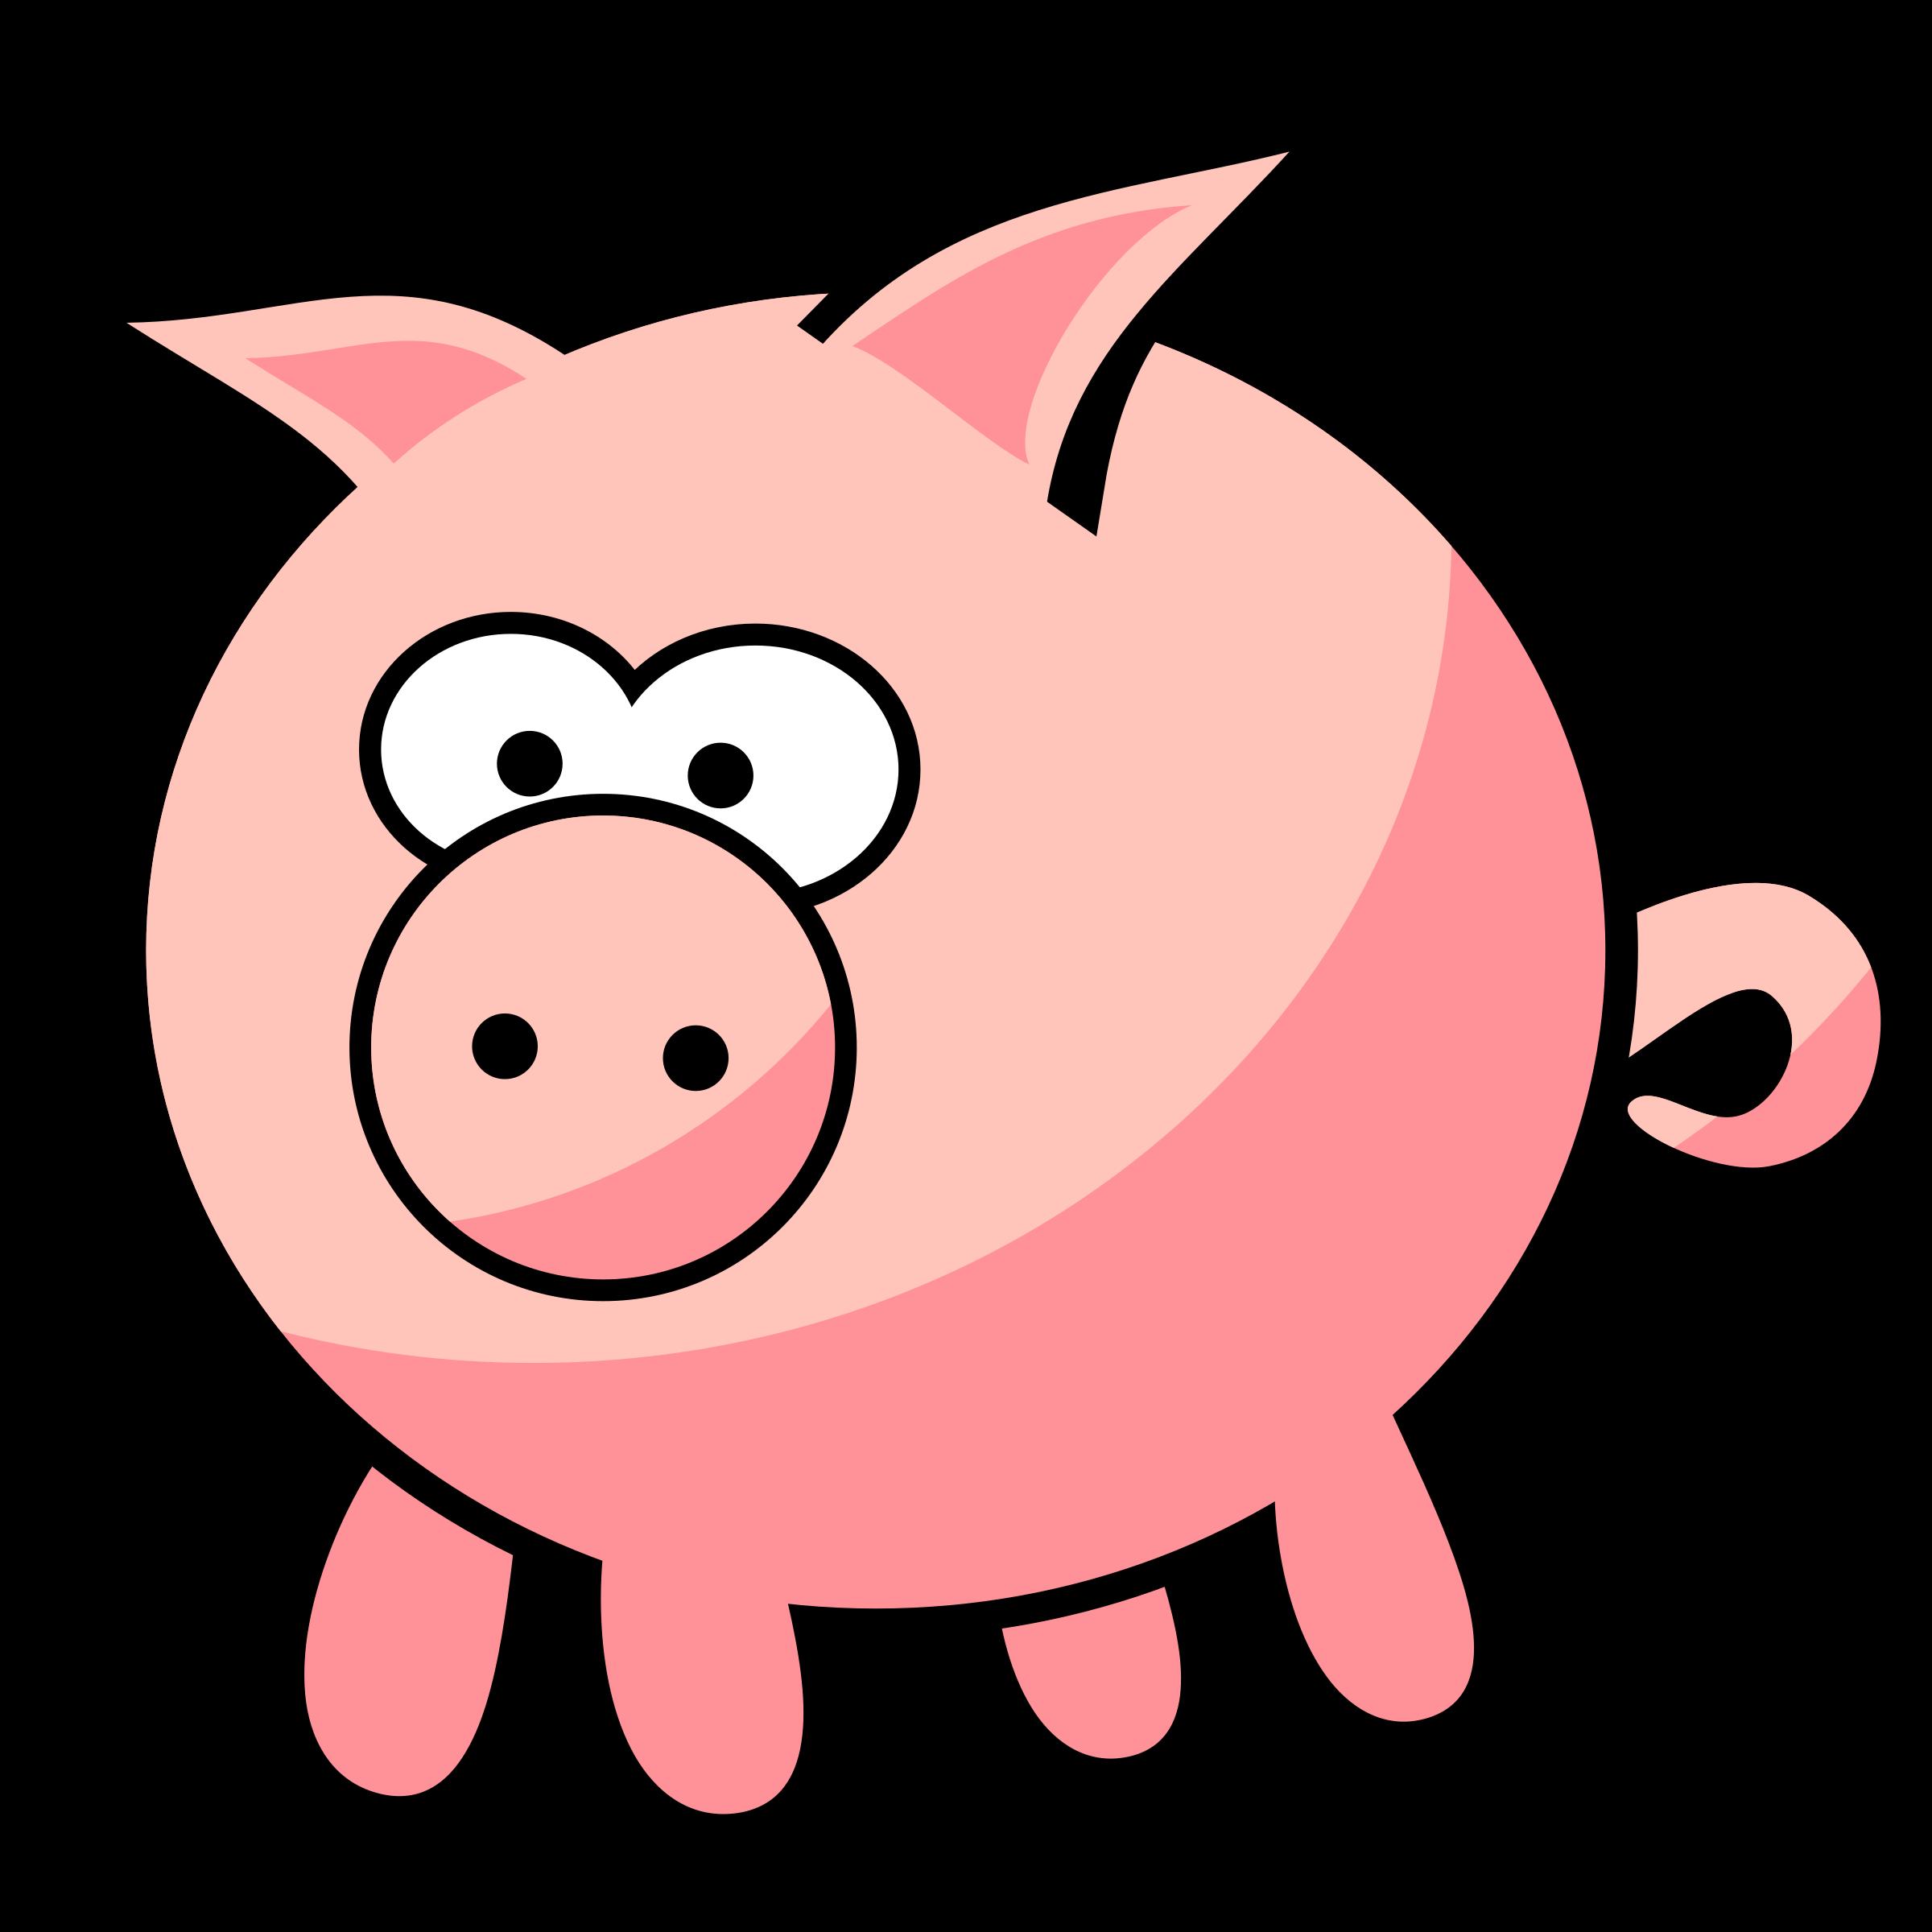 2400x2400 Pig Clipart Transparent